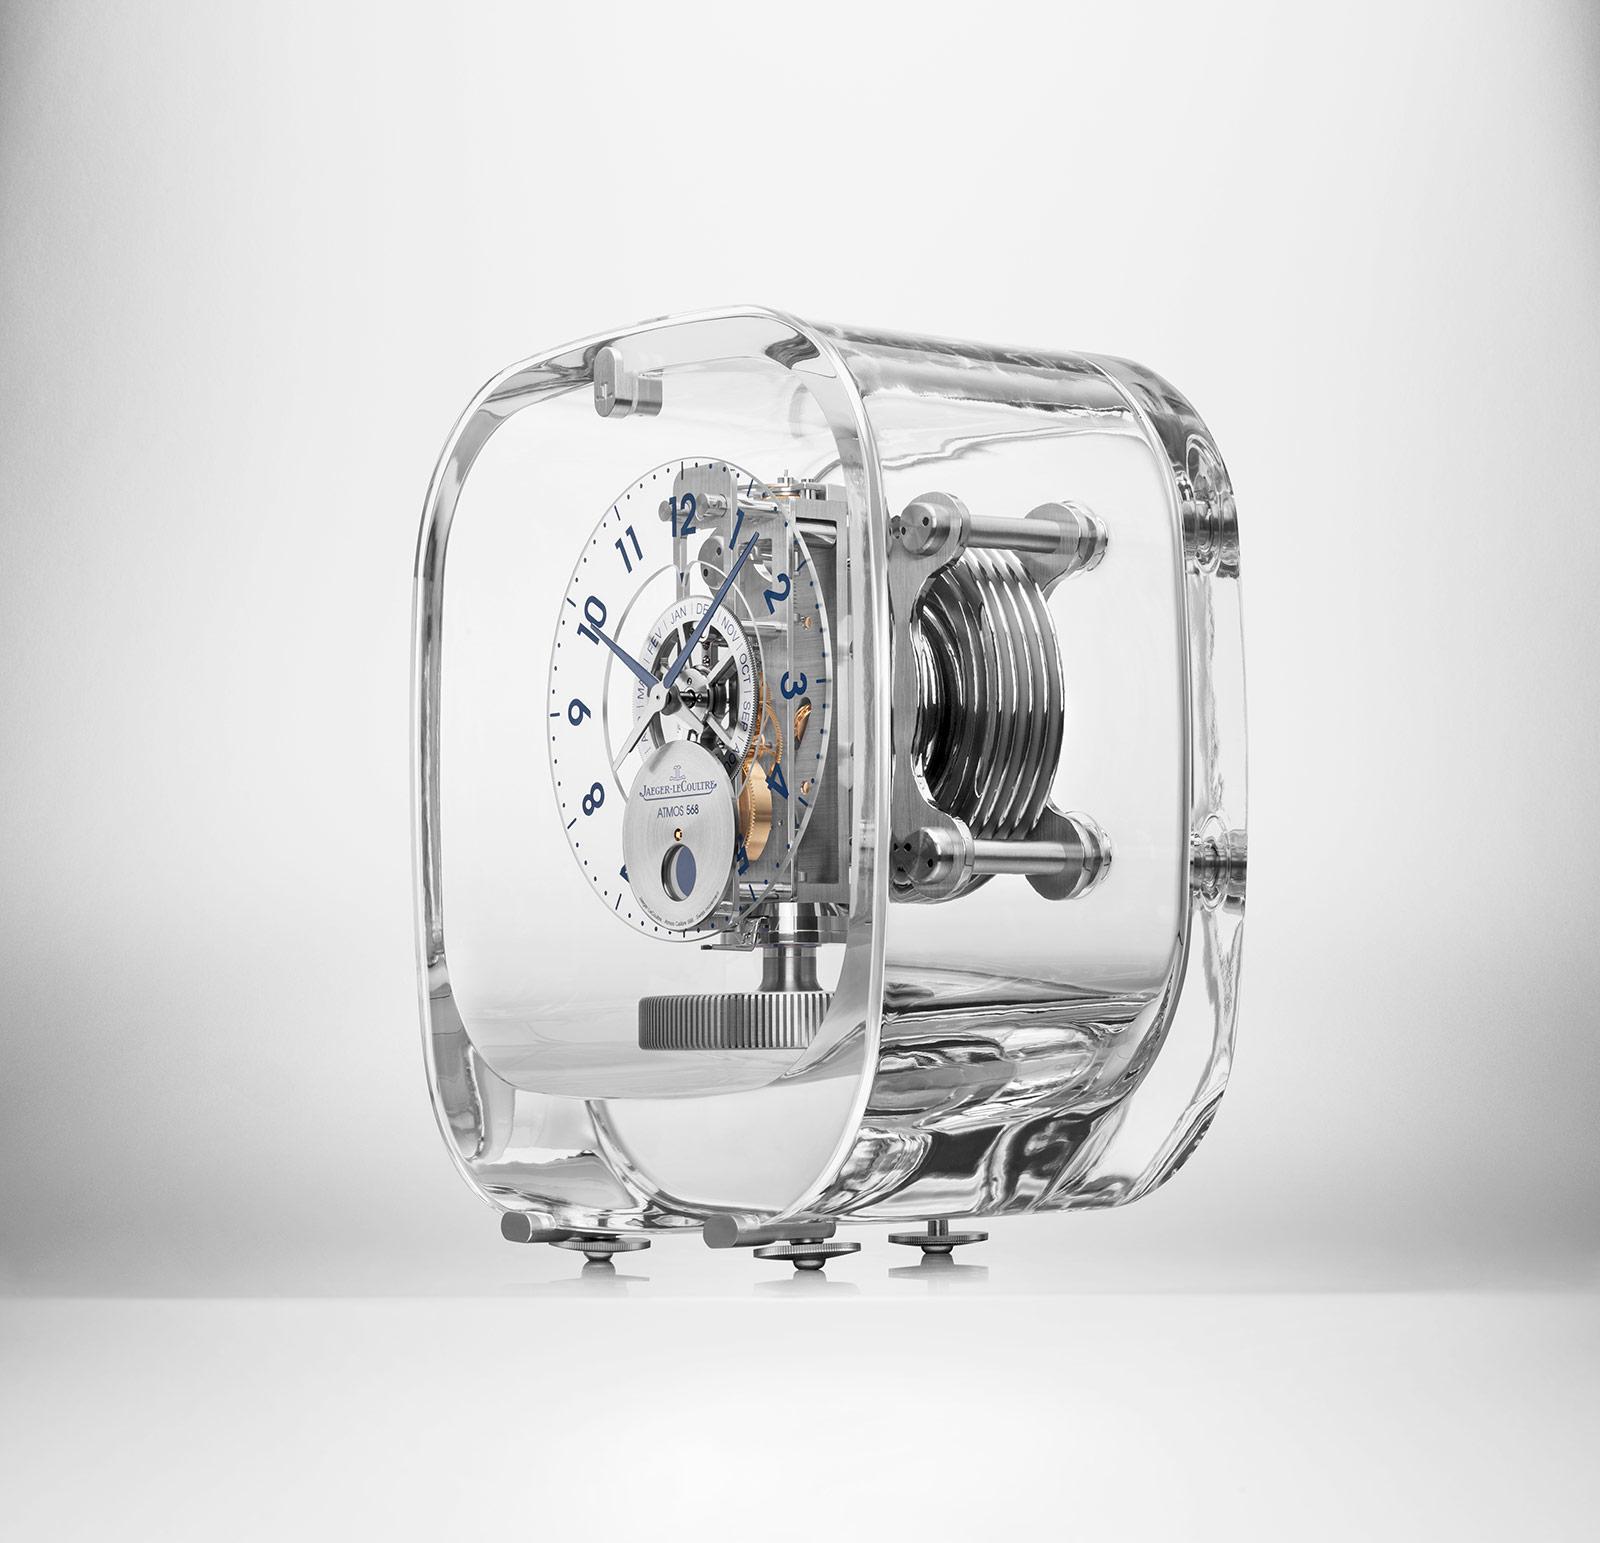 jaeger-lecoultre-atmos-568-marc-newson-5